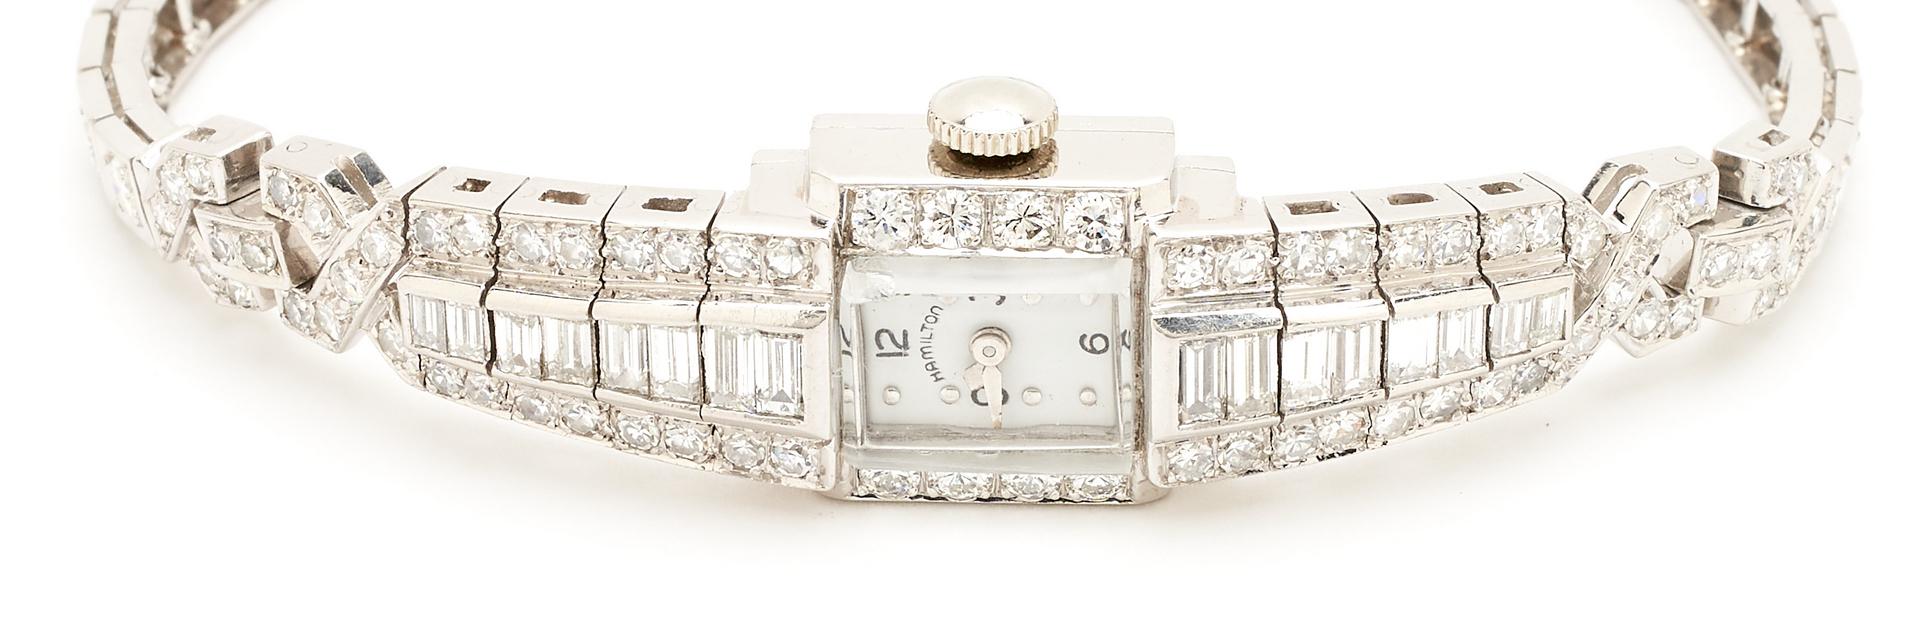 Lot 53: Vintage Hamilton Diamond & Plat. Watch